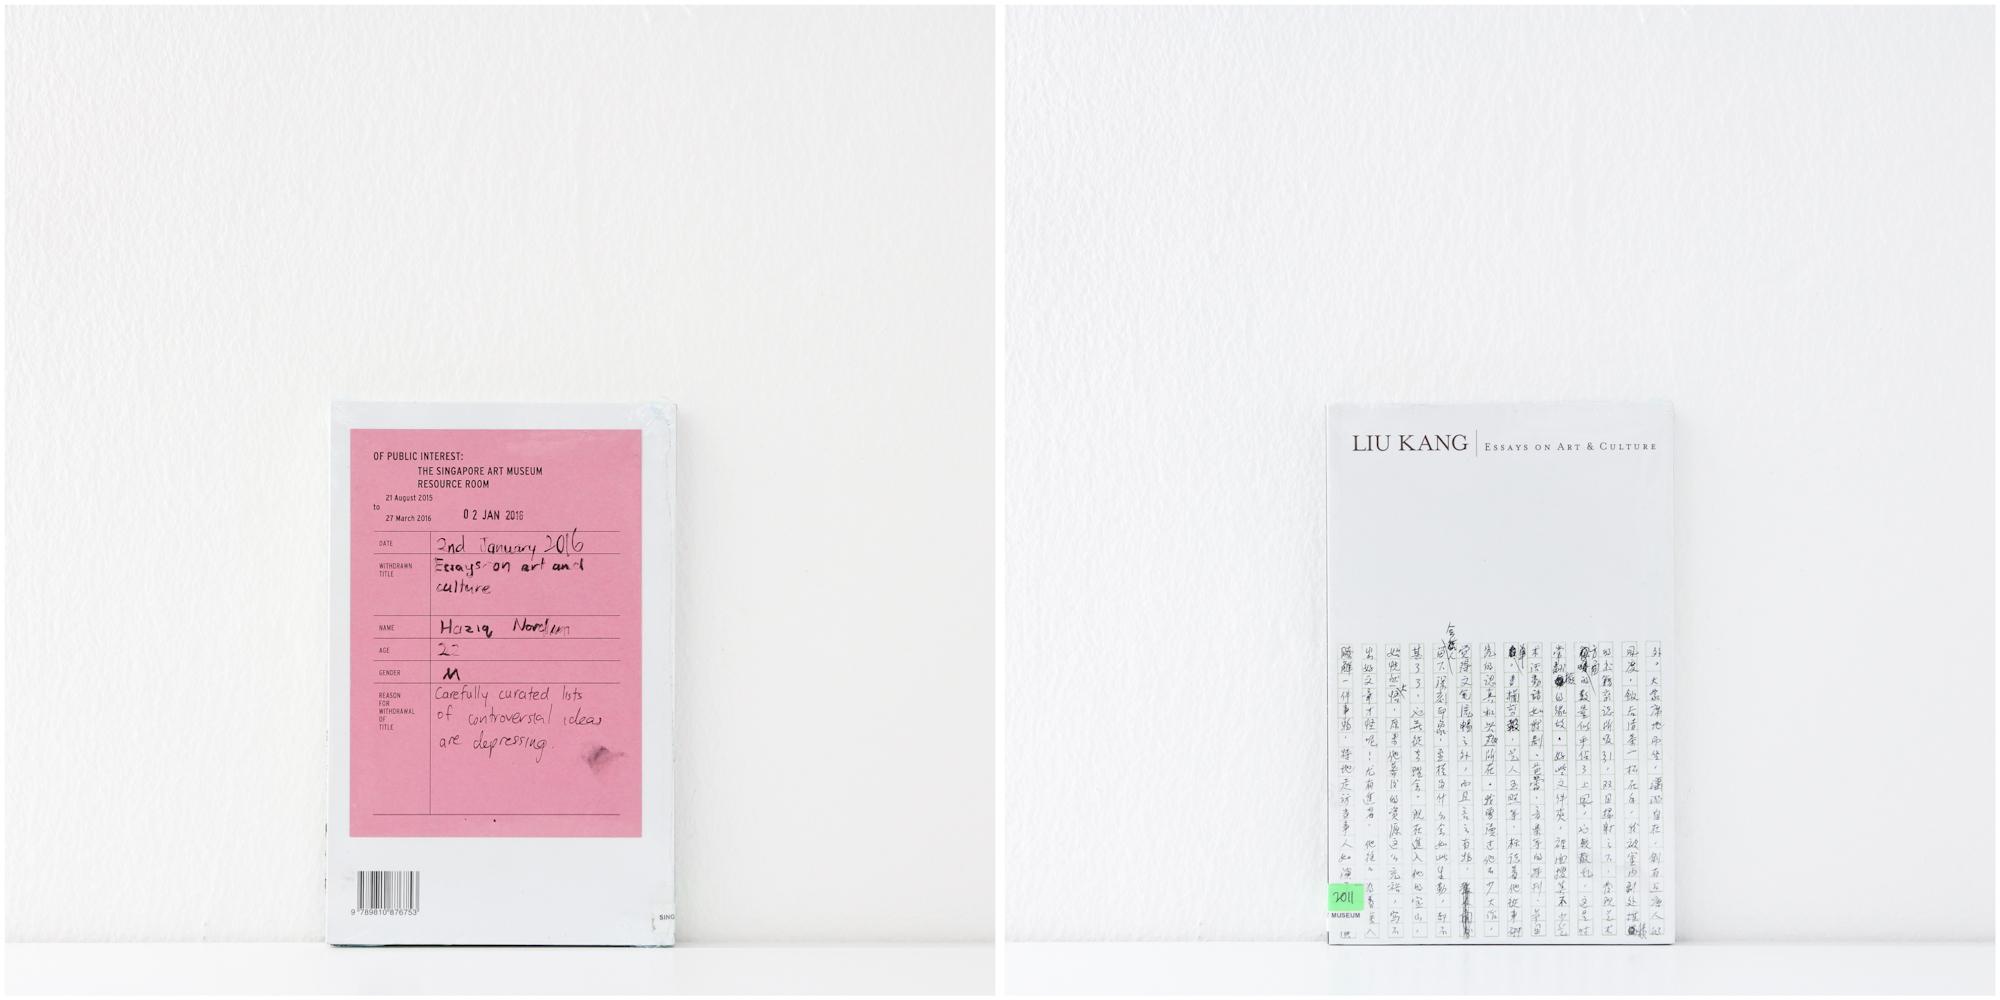 'Liu Kang: Essays on Art and Culture', 2/1/16, Haziq Nordin, 22, Male